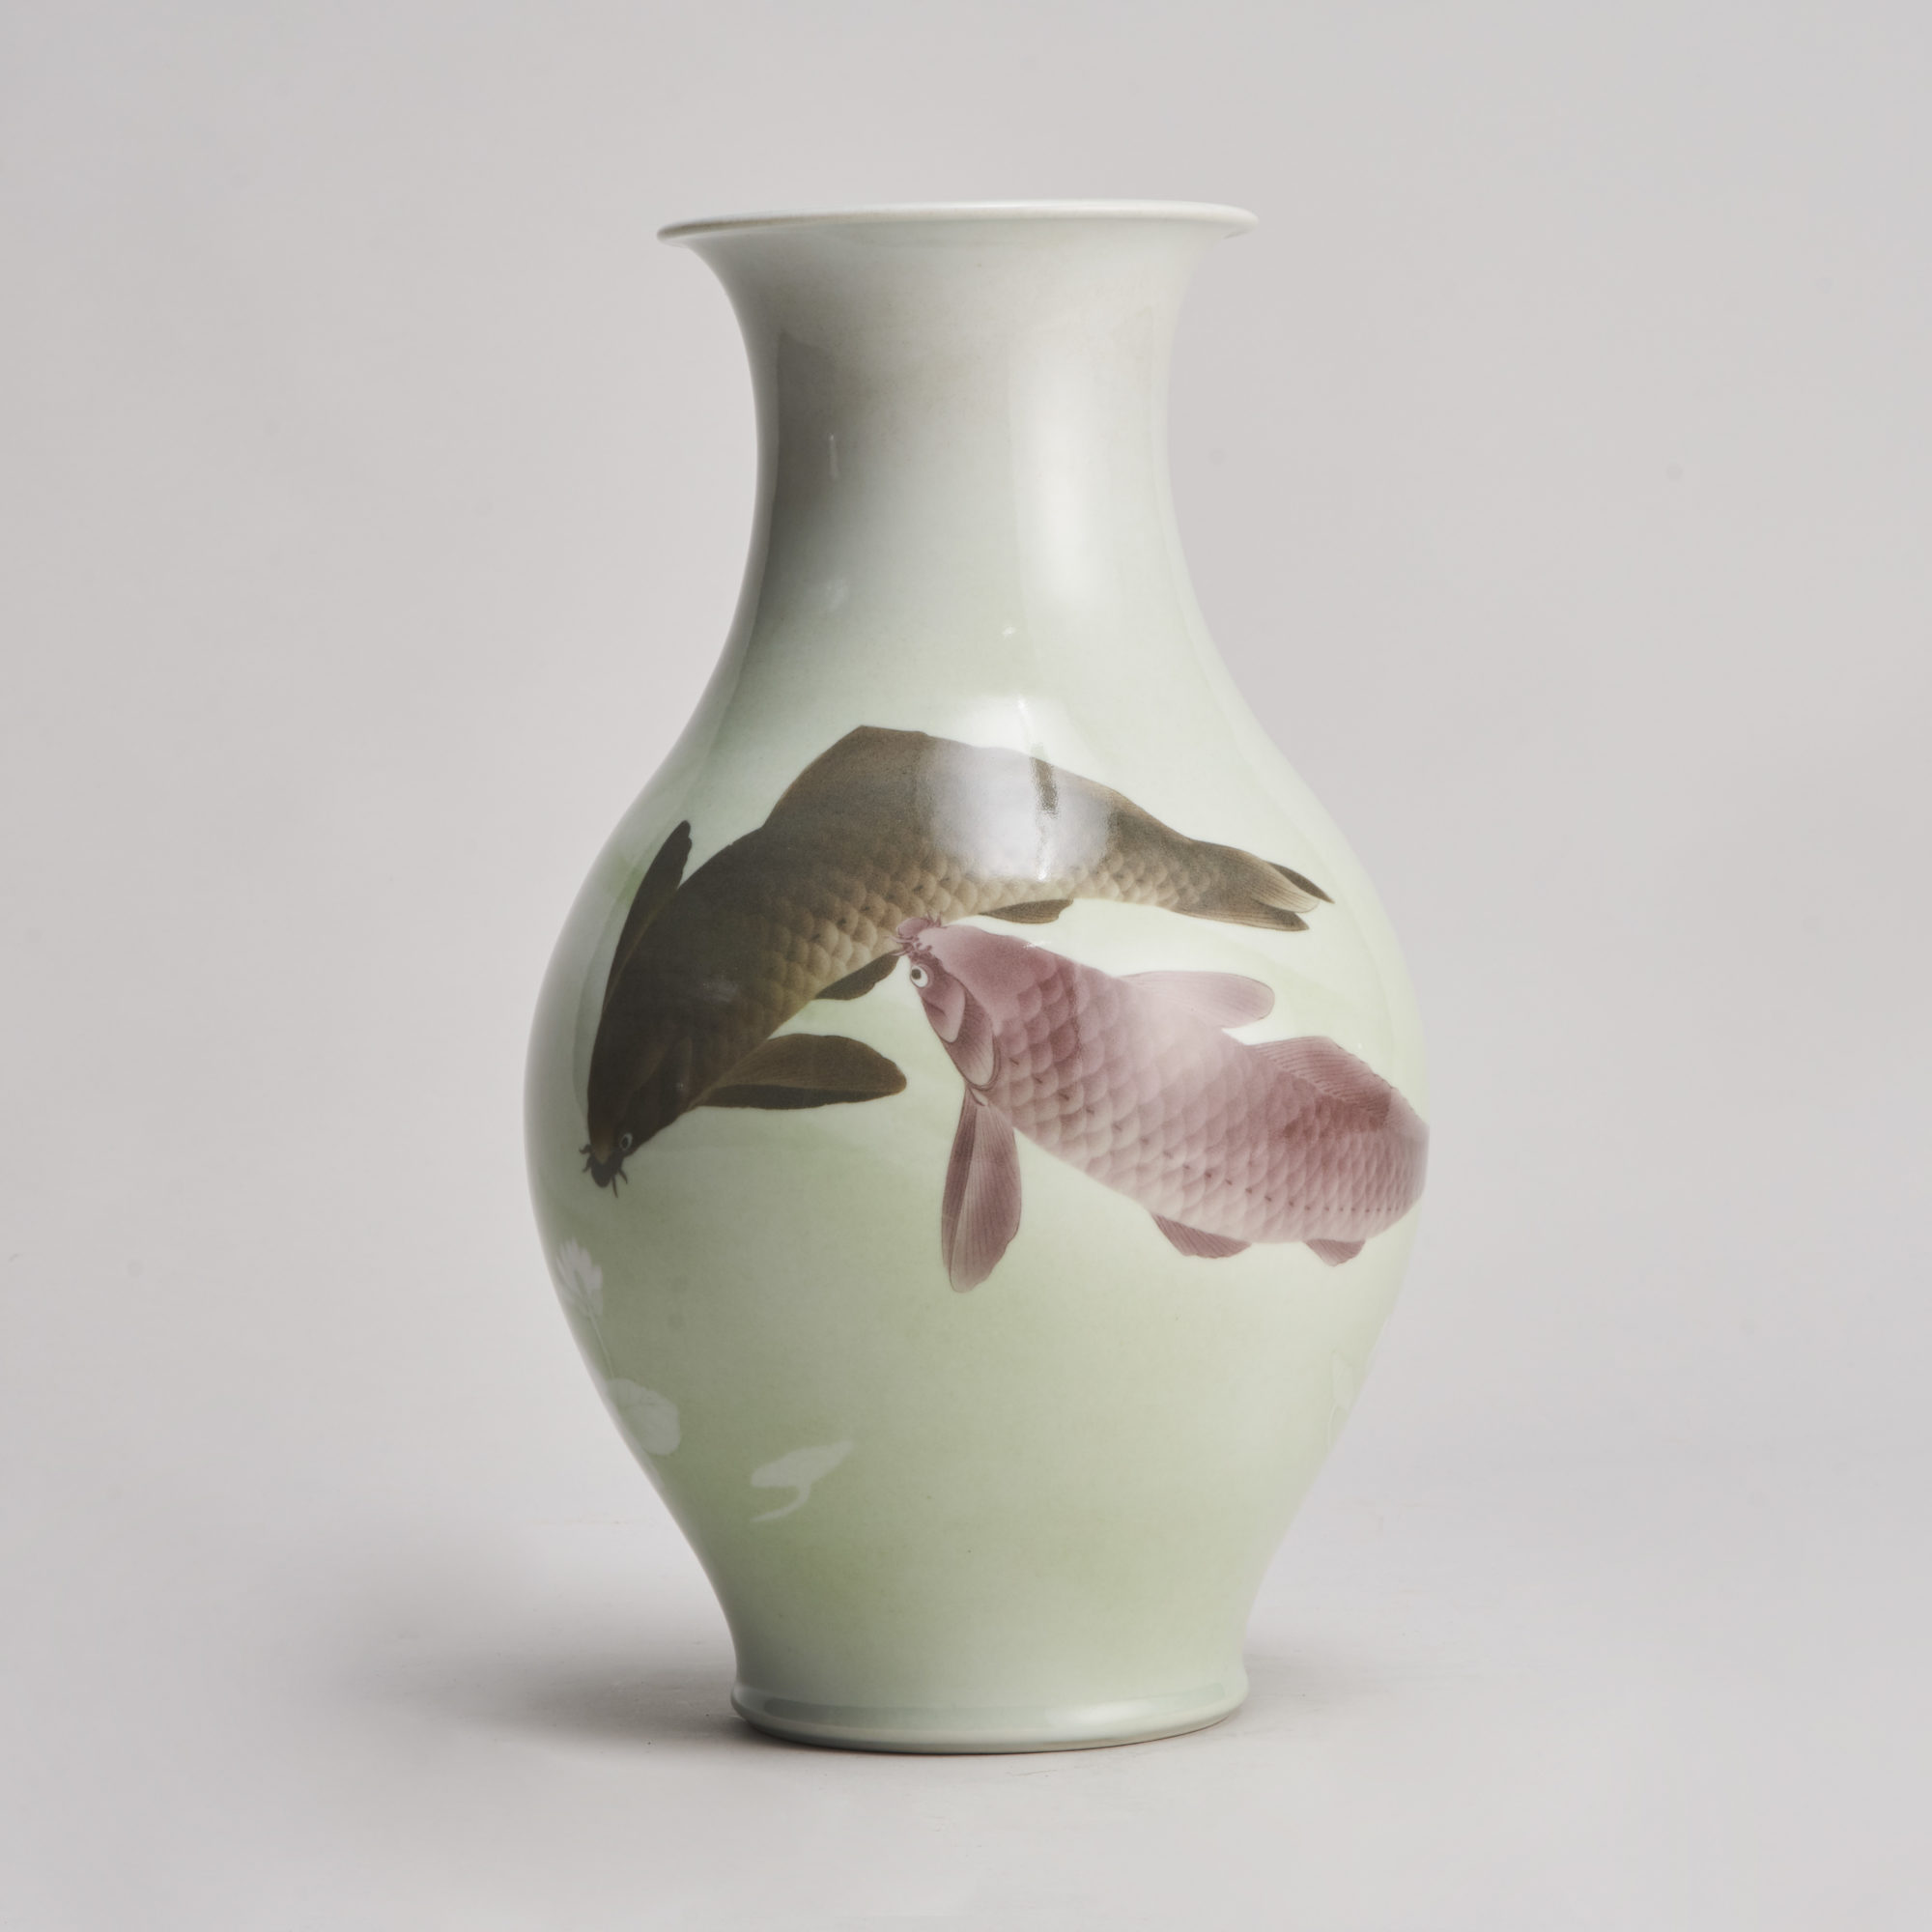 Makuzu Kozan   A delightful Japanese vase with Carp decoration signed Makuzu Kozan